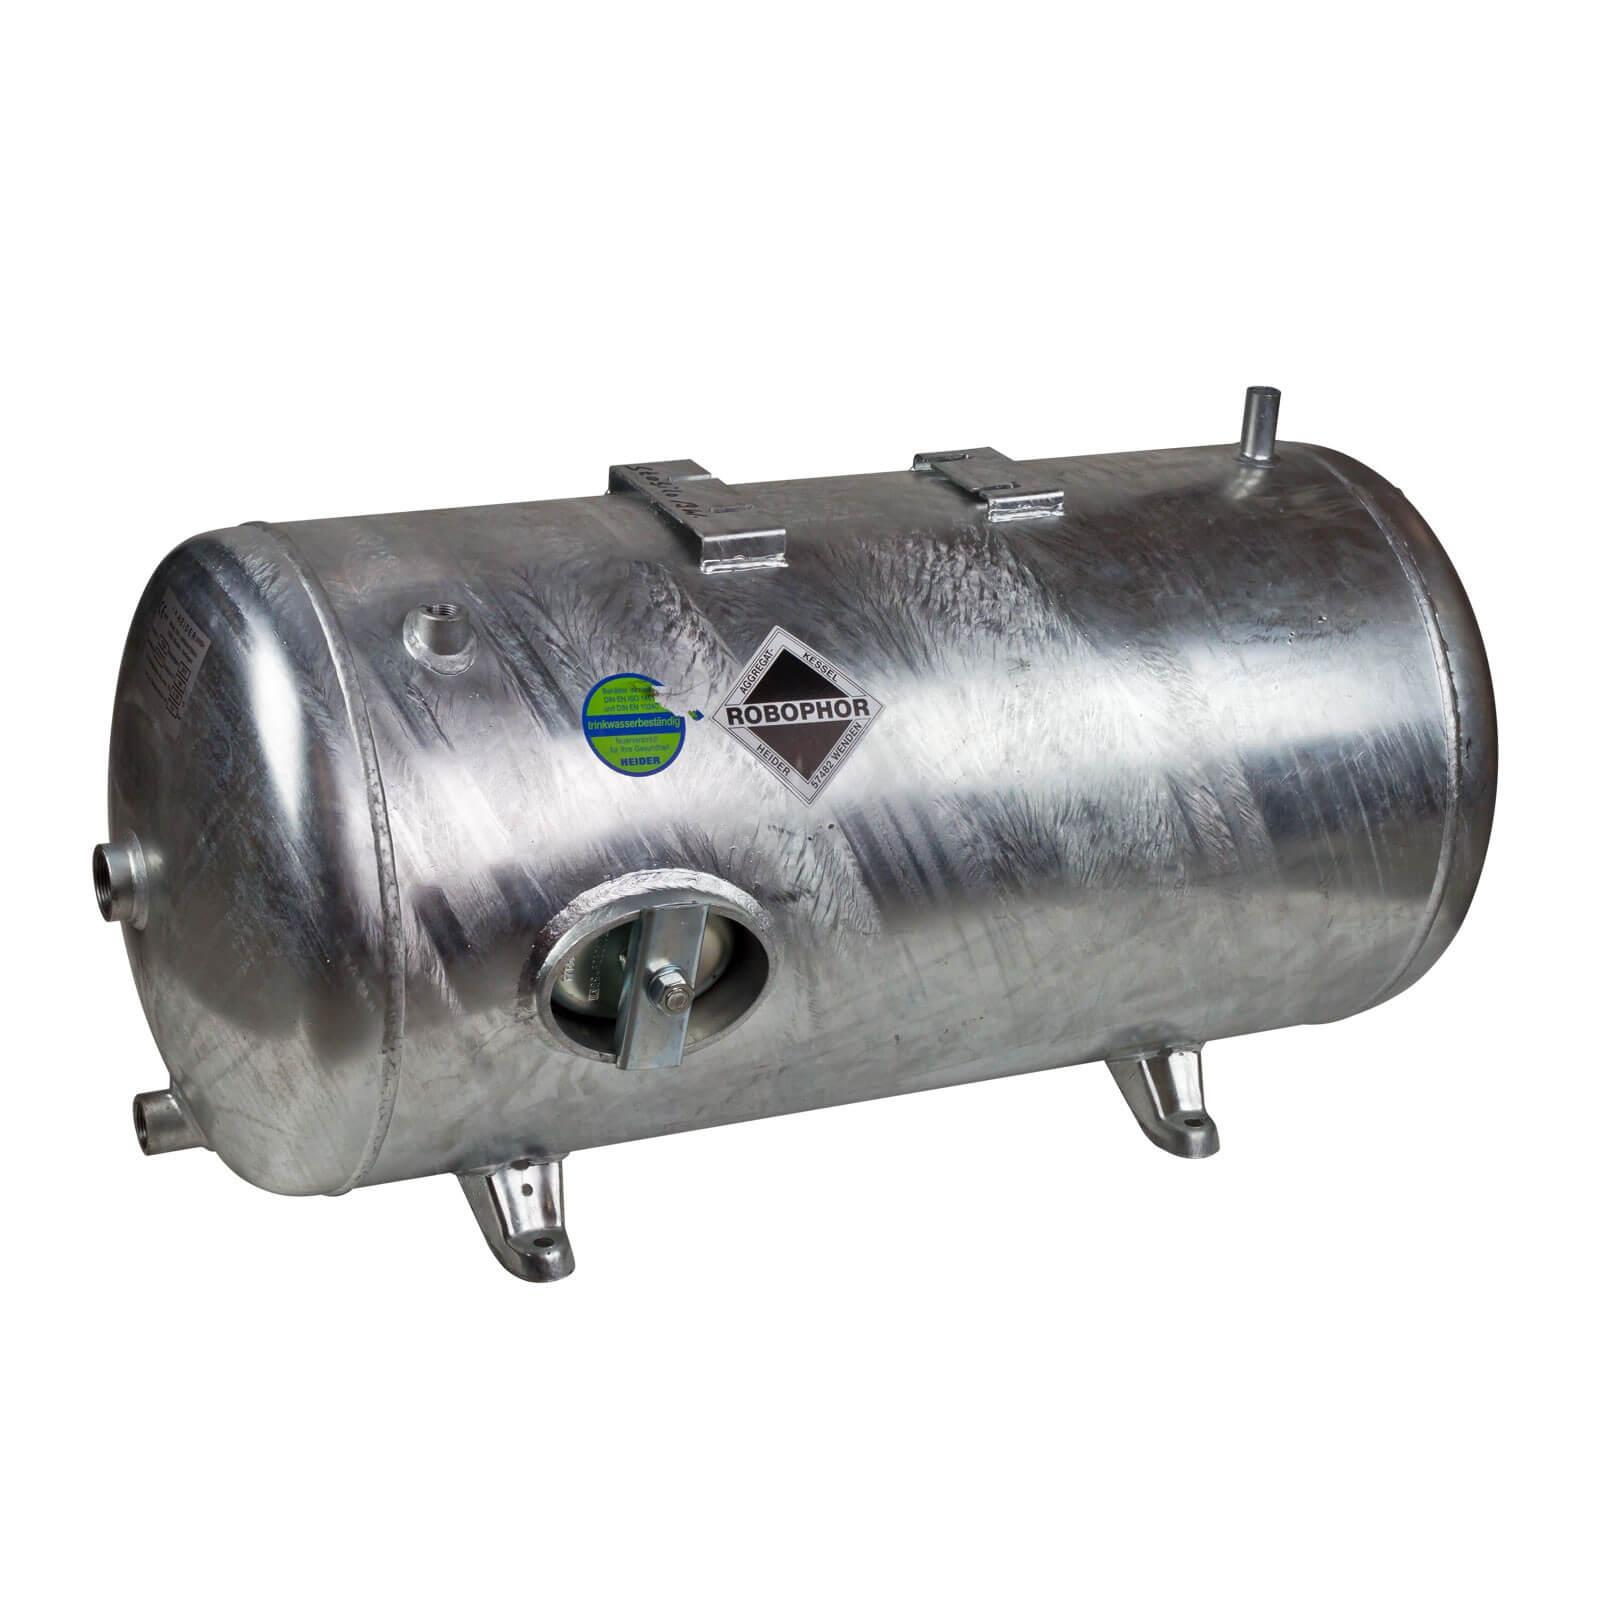 druckbehälter 245 liter 6 bar druckkessel liegend kolbenpumpen